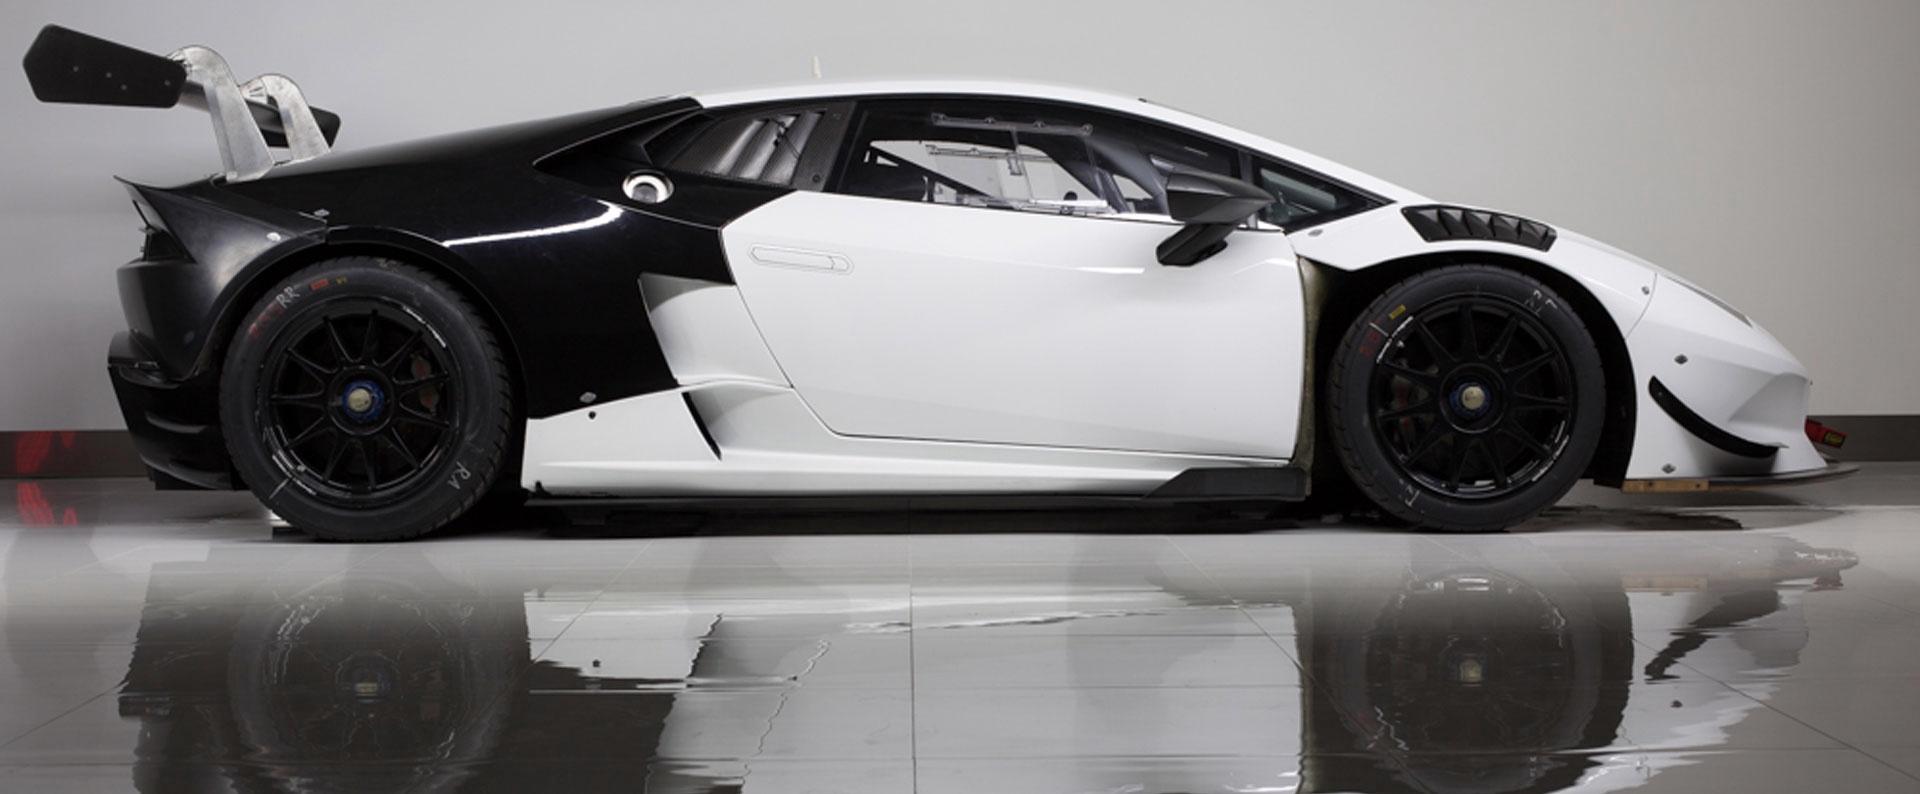 Used 2015 Lamborghini Huracan LP 620 Super Trofeo Race Car | Miami, FL